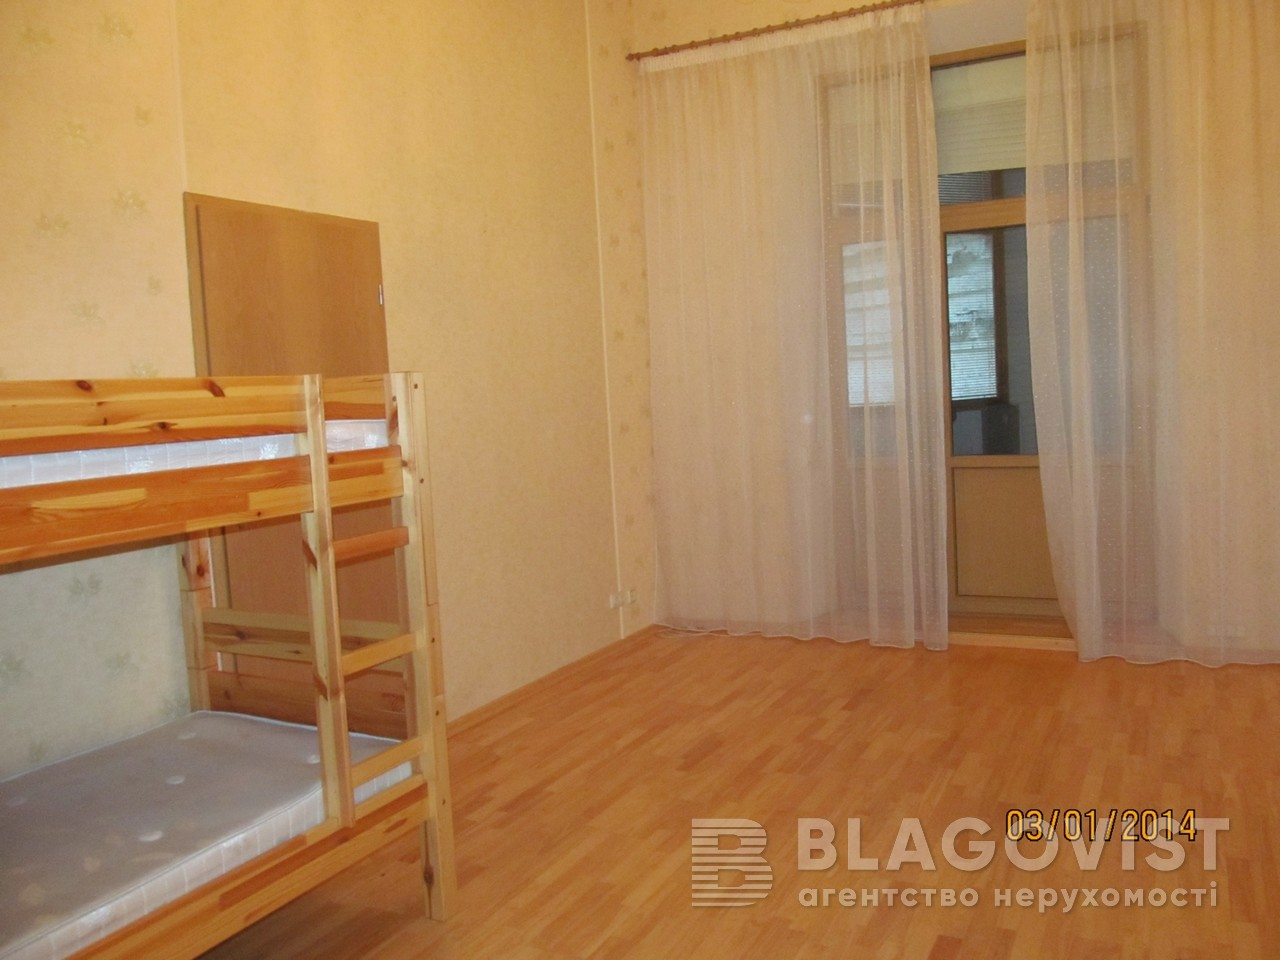 Квартира G-12026, Городецкого Архитектора, 11б, Киев - Фото 10